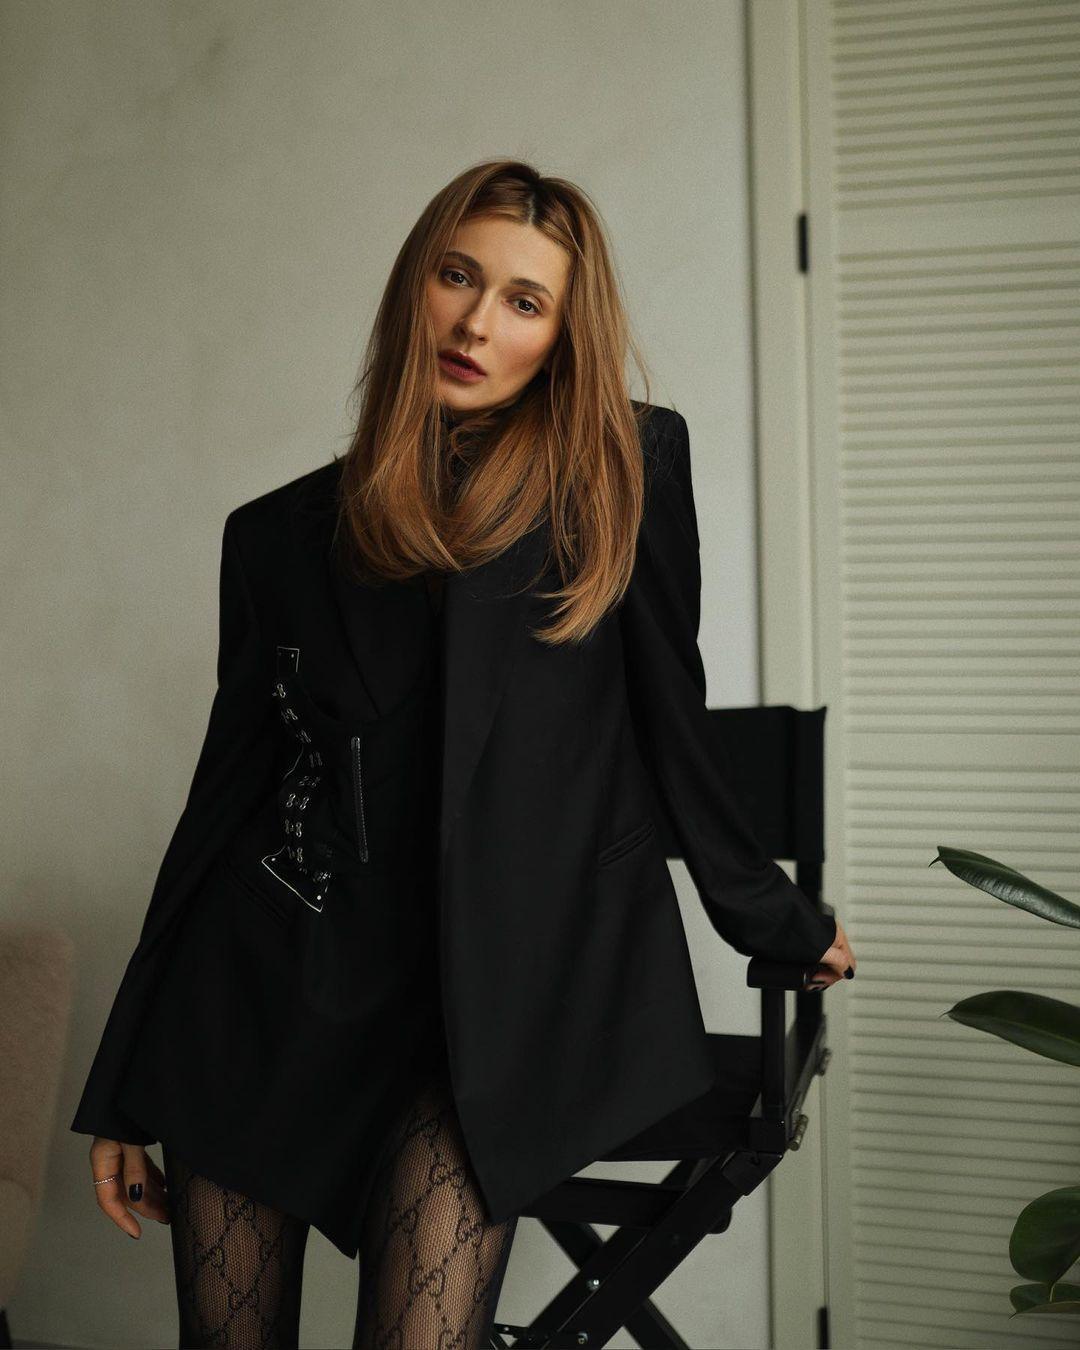 Тетяна Решетняк / instagram.com/tayanna_reshetnyak